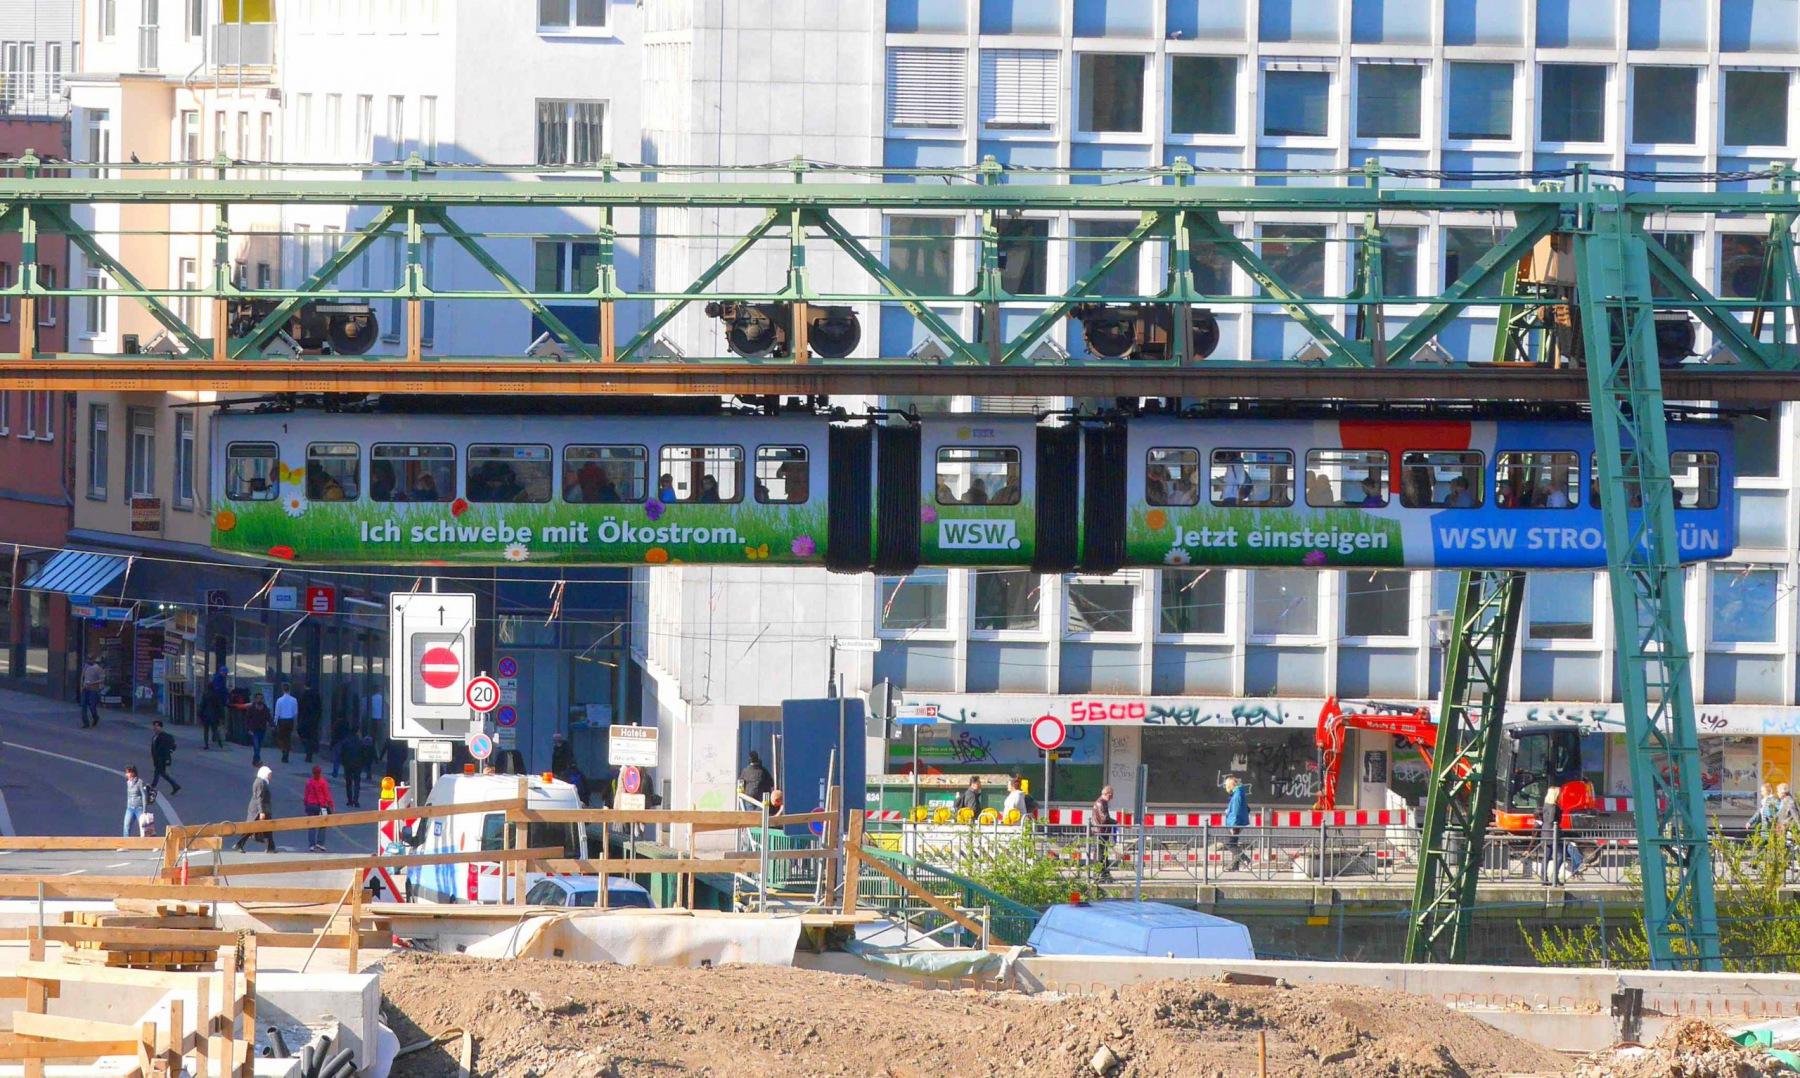 2016-04-20_216_Wuppertal_Umbau-Döppersberg-scaled